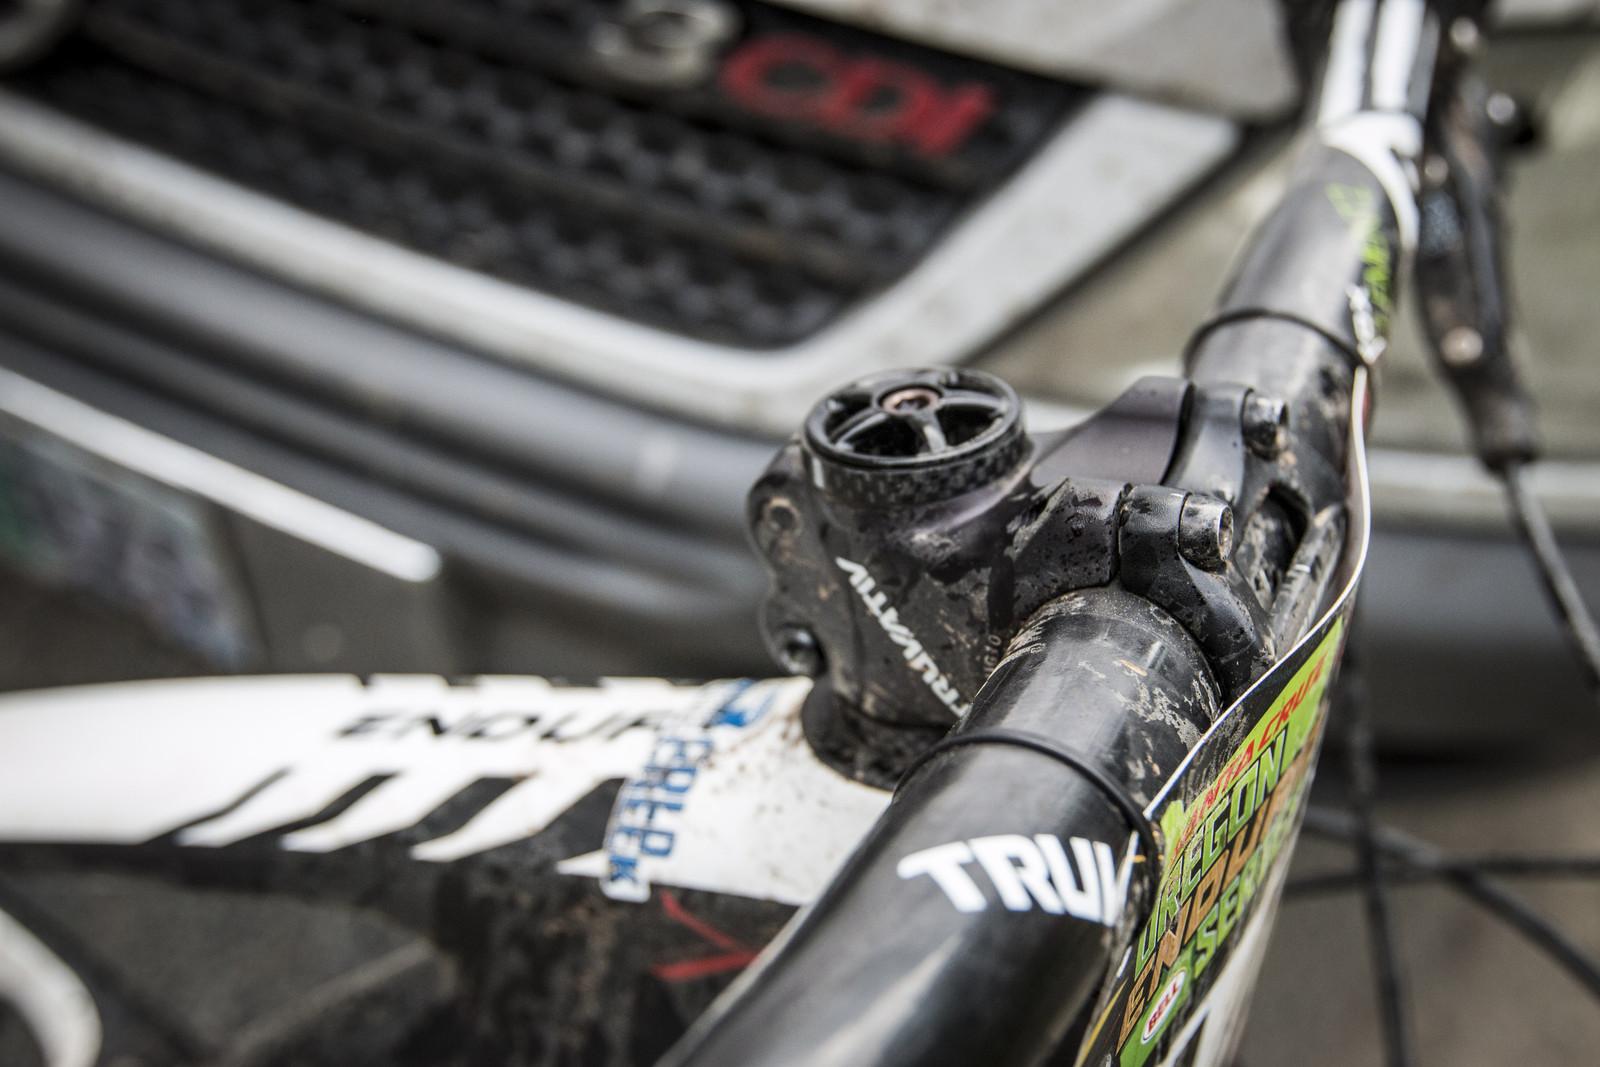 50mm Truvativ Holzfeller Stem on Kirt Voreis' Specialized Enduro 29 - WINNING BIKE: Kirt Voreis' Specialized Enduro 29 - Mountain Biking Pictures - Vital MTB